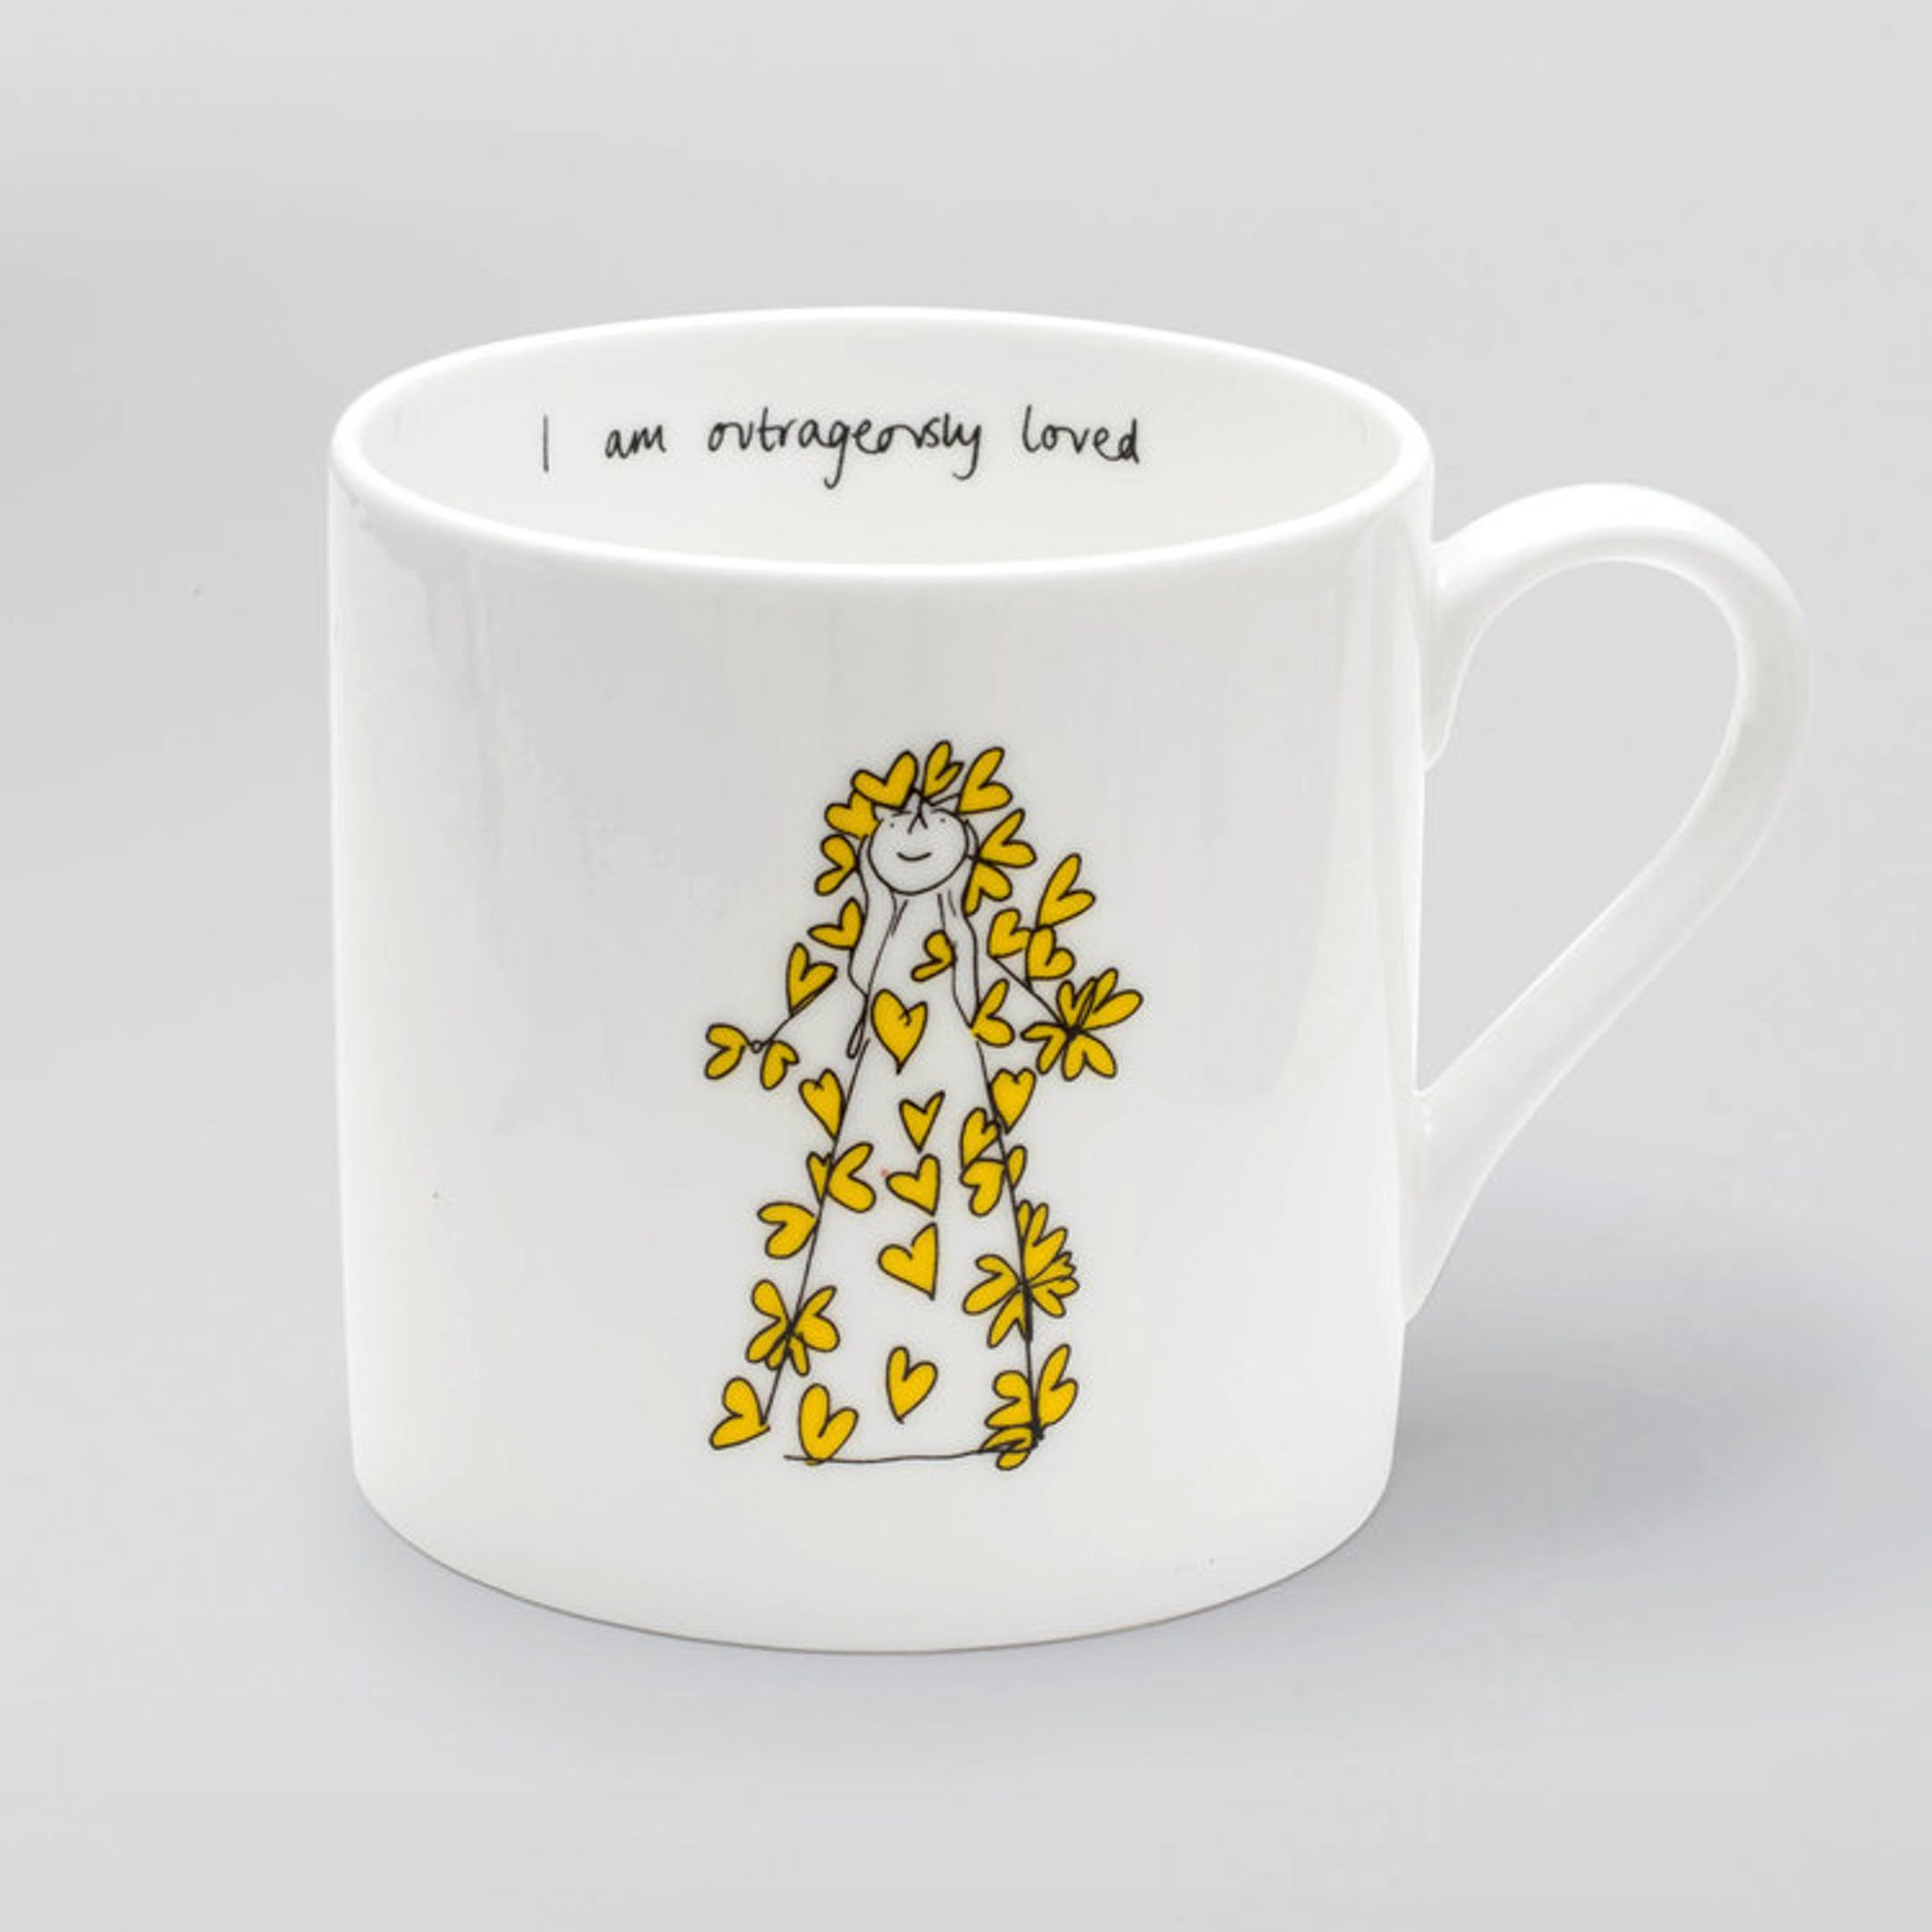 I am outrageously loved Mug - I Am So Many Things   Thea Muir   Cheerfully Given - Christian Mugs UK